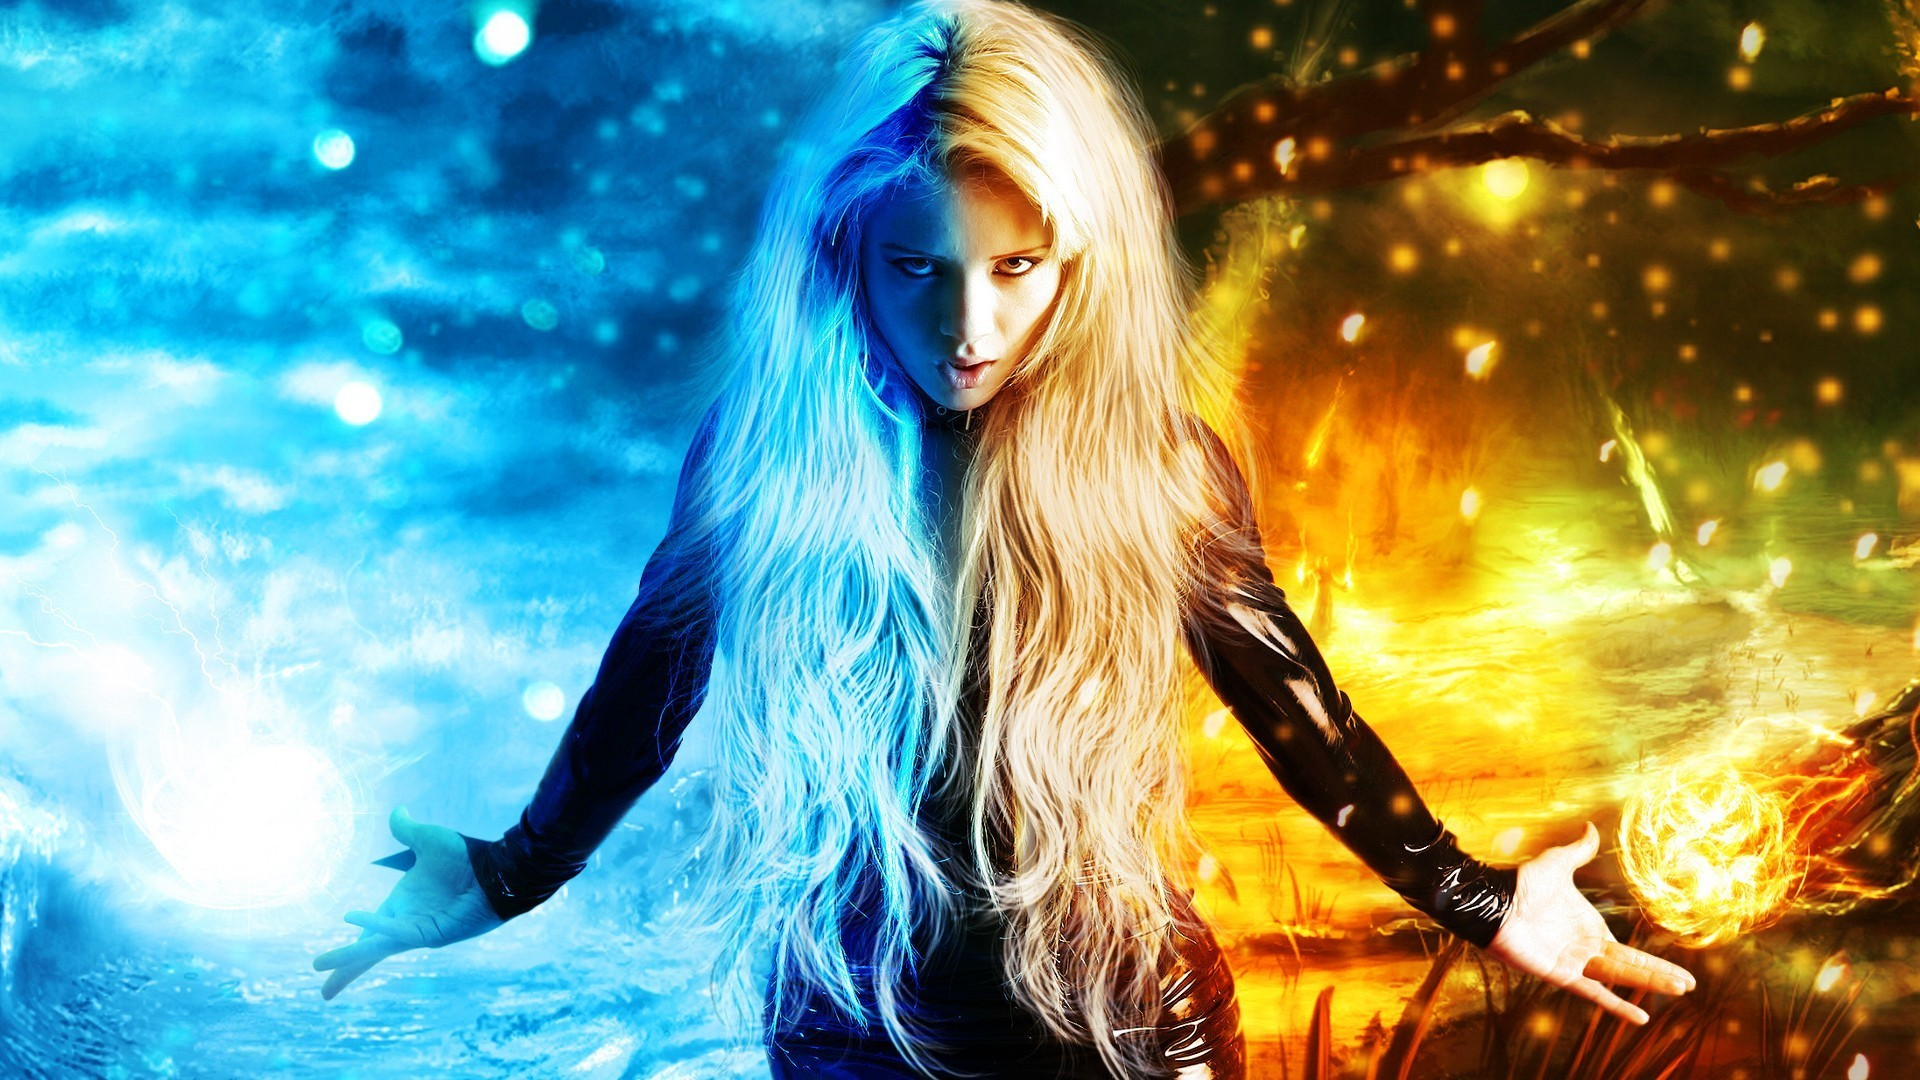 … fantasy girl wallpaper, fire hd · fantasy, digital art, magic, x-men,  fire, ice, bokeh